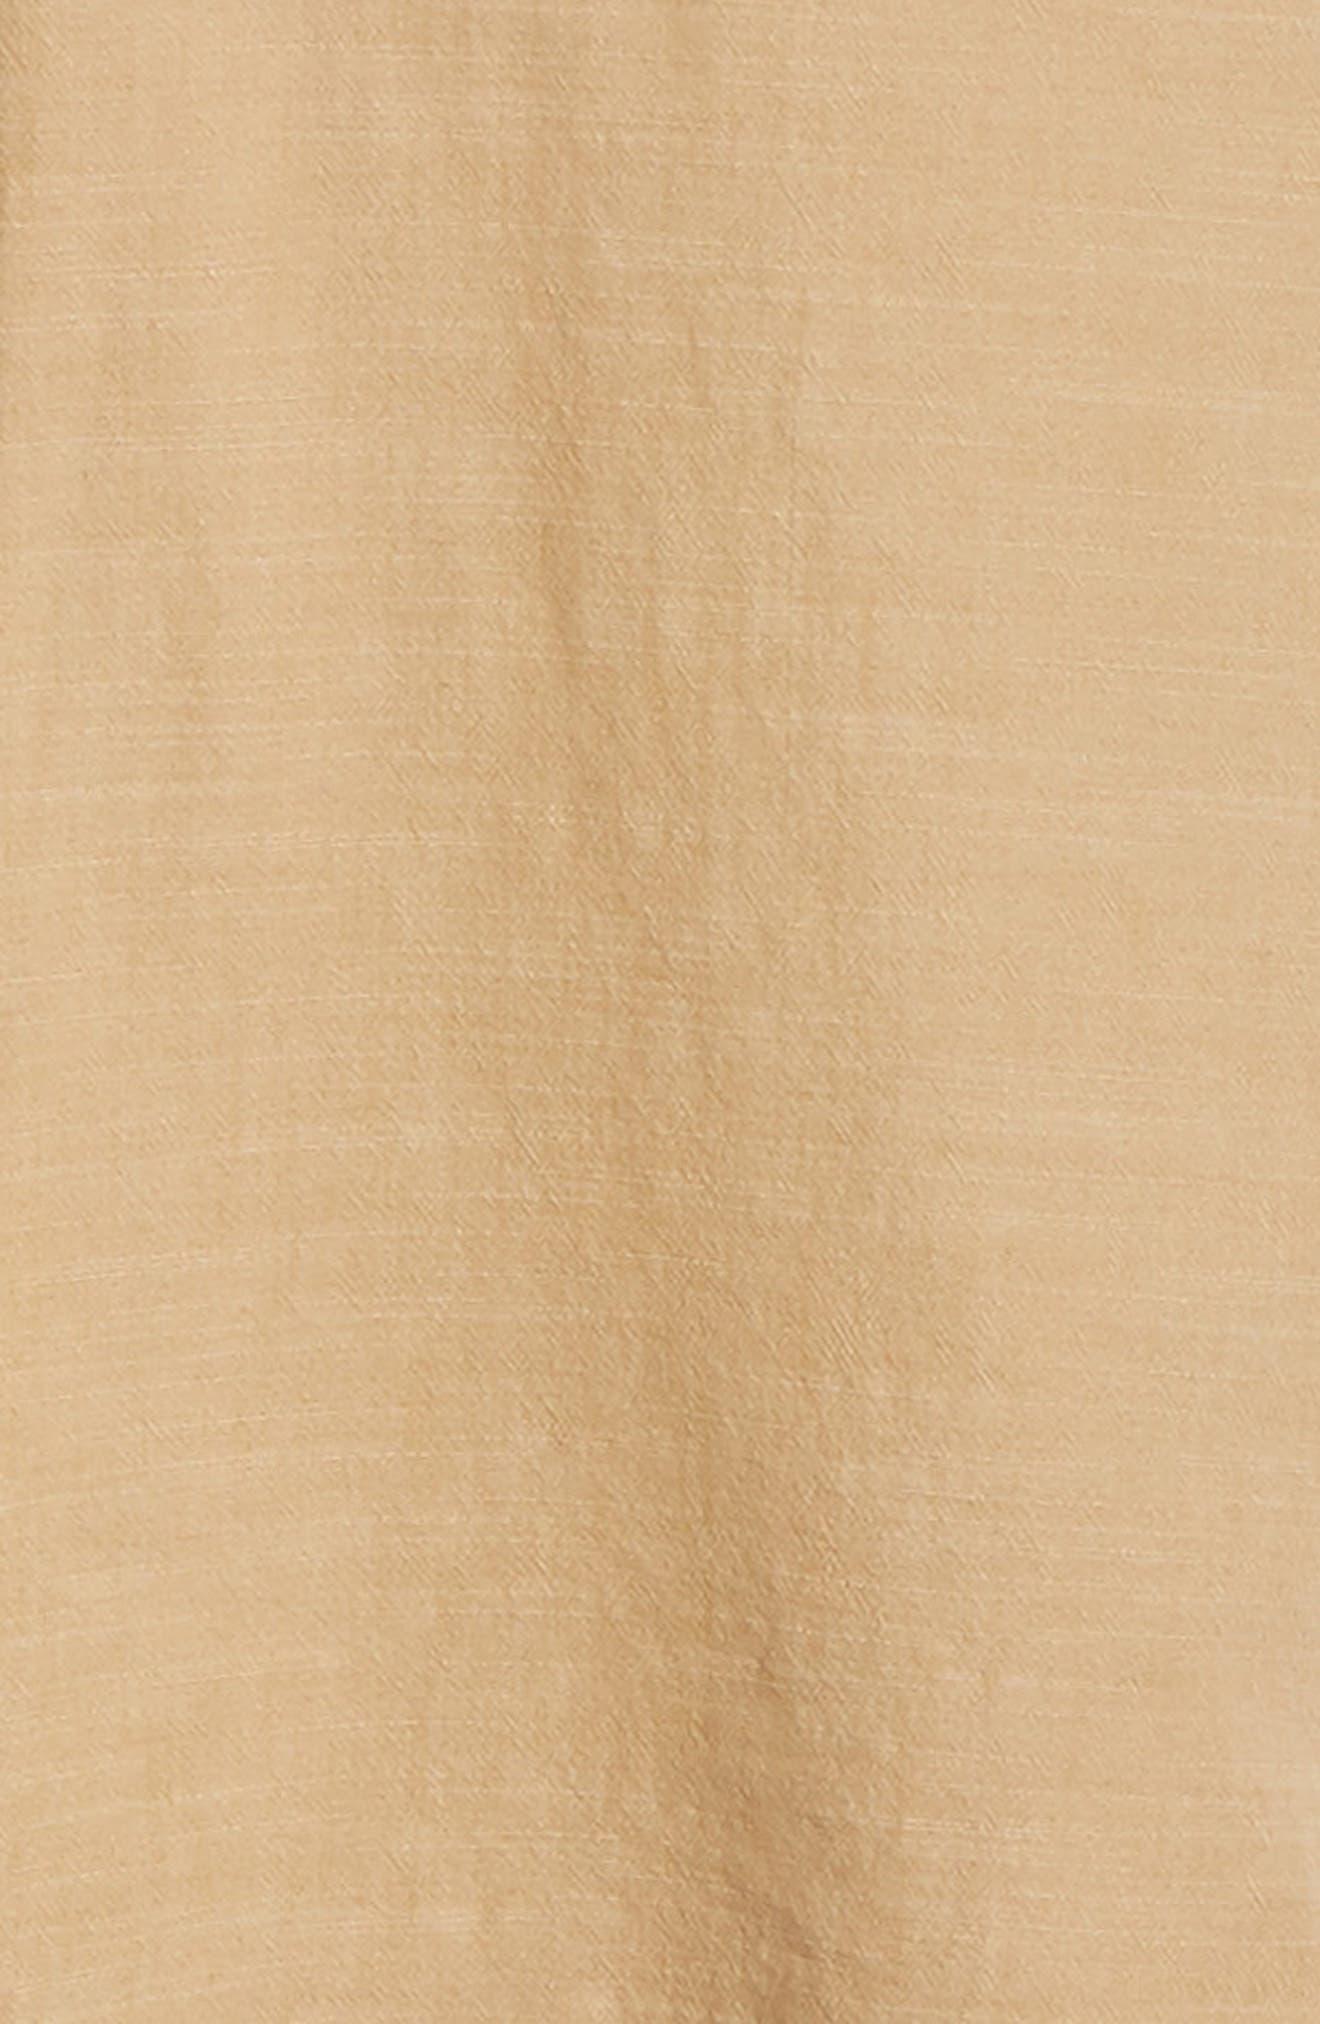 FRYE,                             Addison Chambray Woven Shirt,                             Alternate thumbnail 6, color,                             KRAFT BROWN